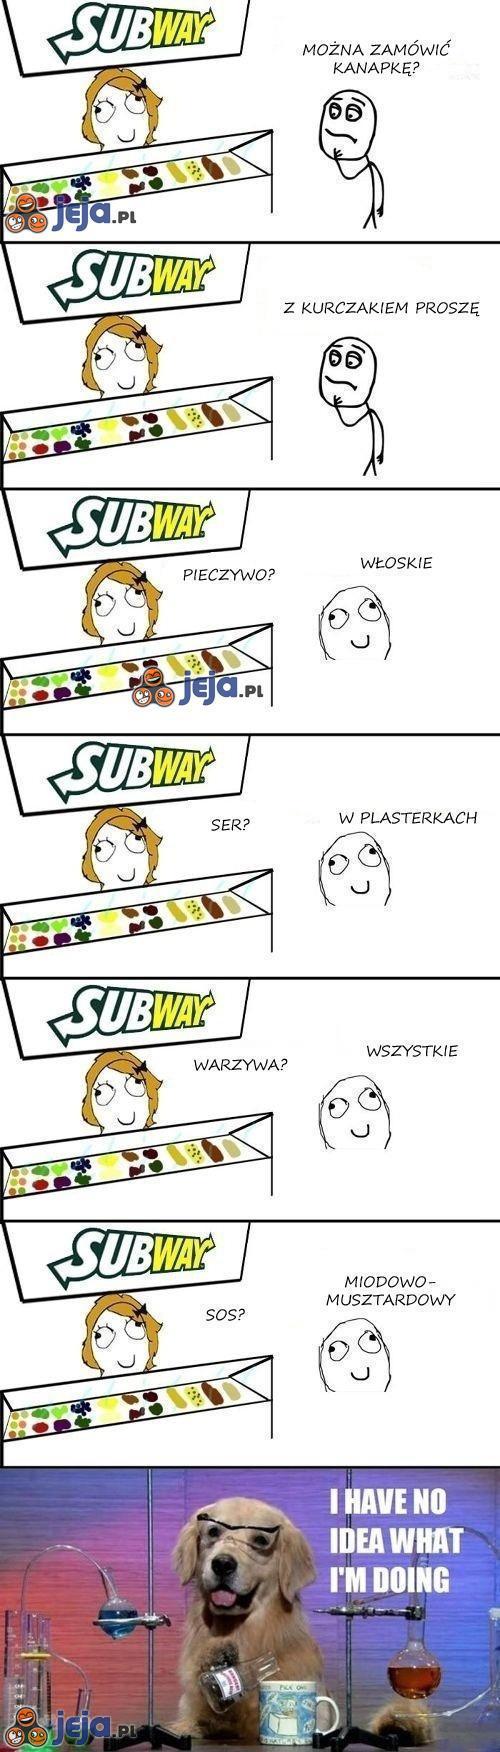 Kanapka w Subway'u